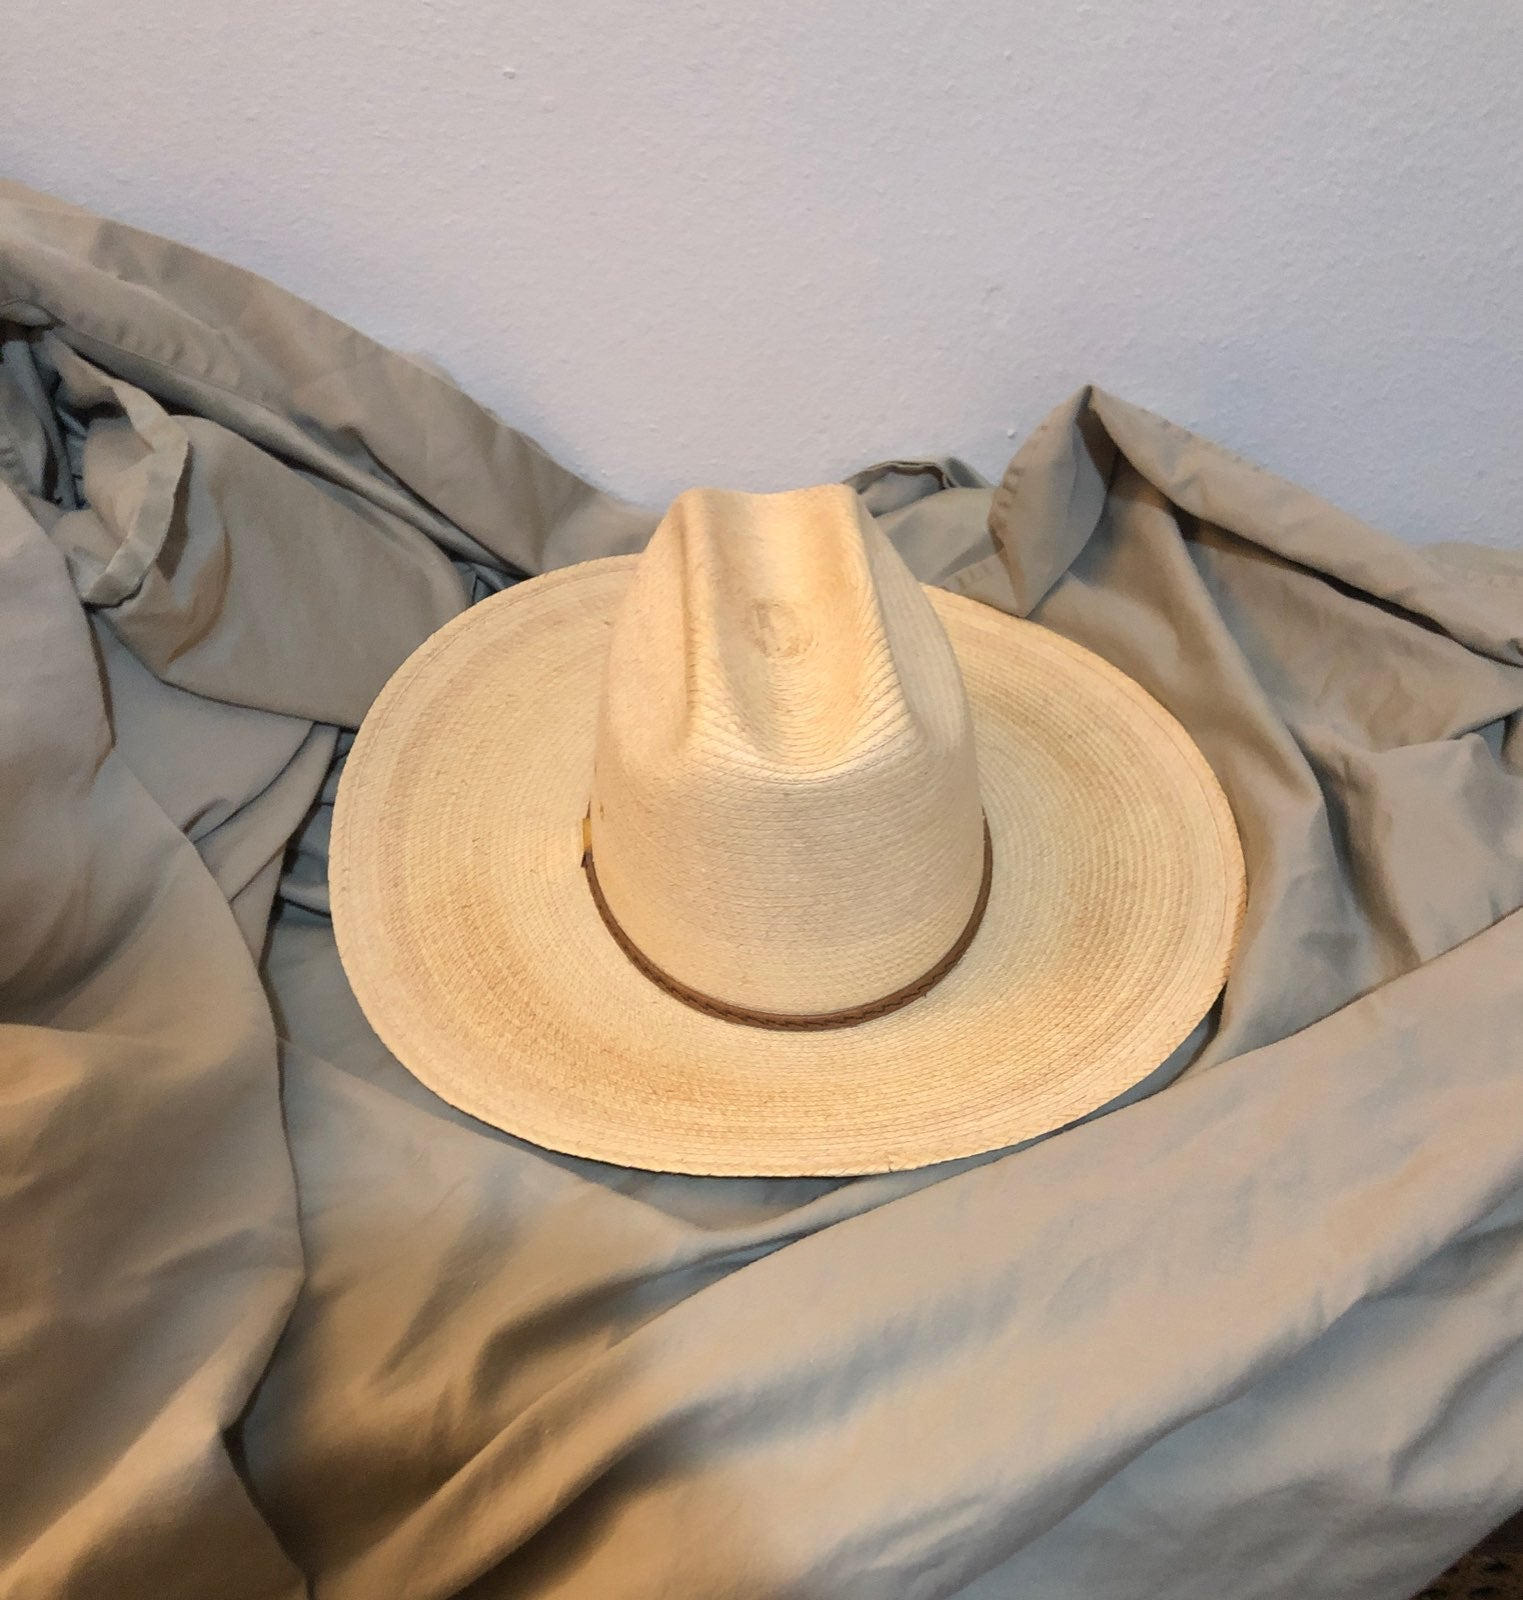 George strait self conforming Pom hat